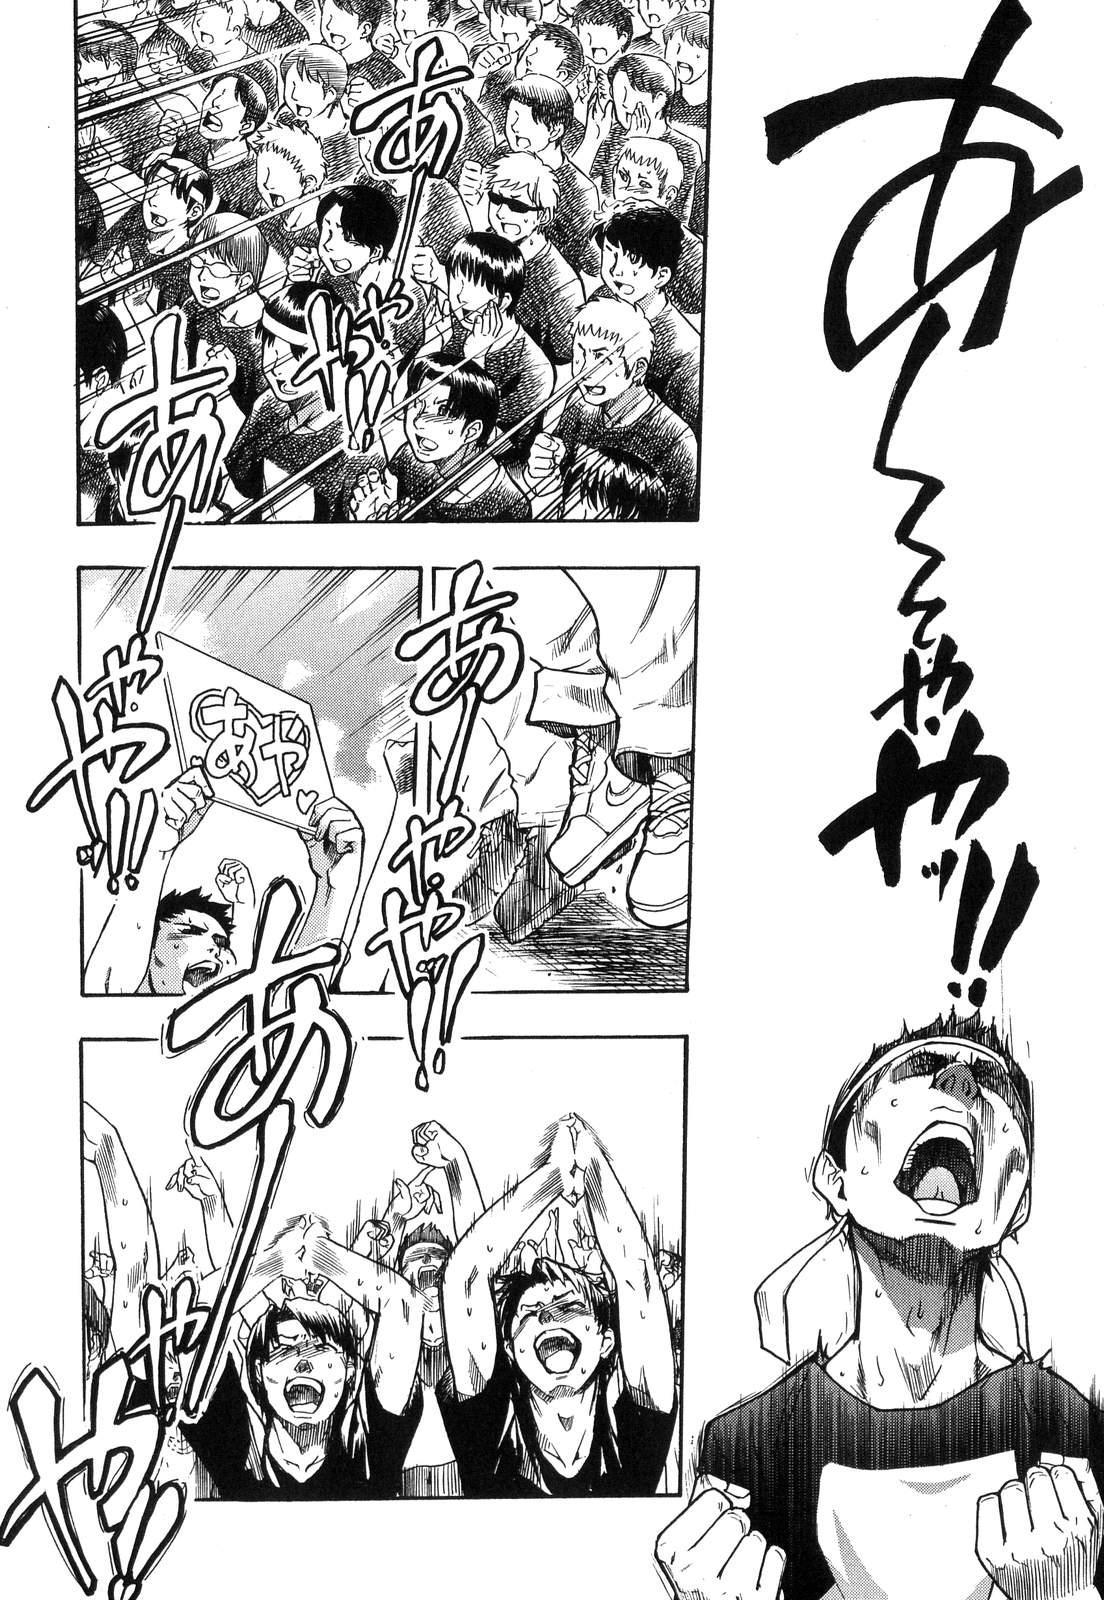 Shining Musume. 6. Rainbow Six 171